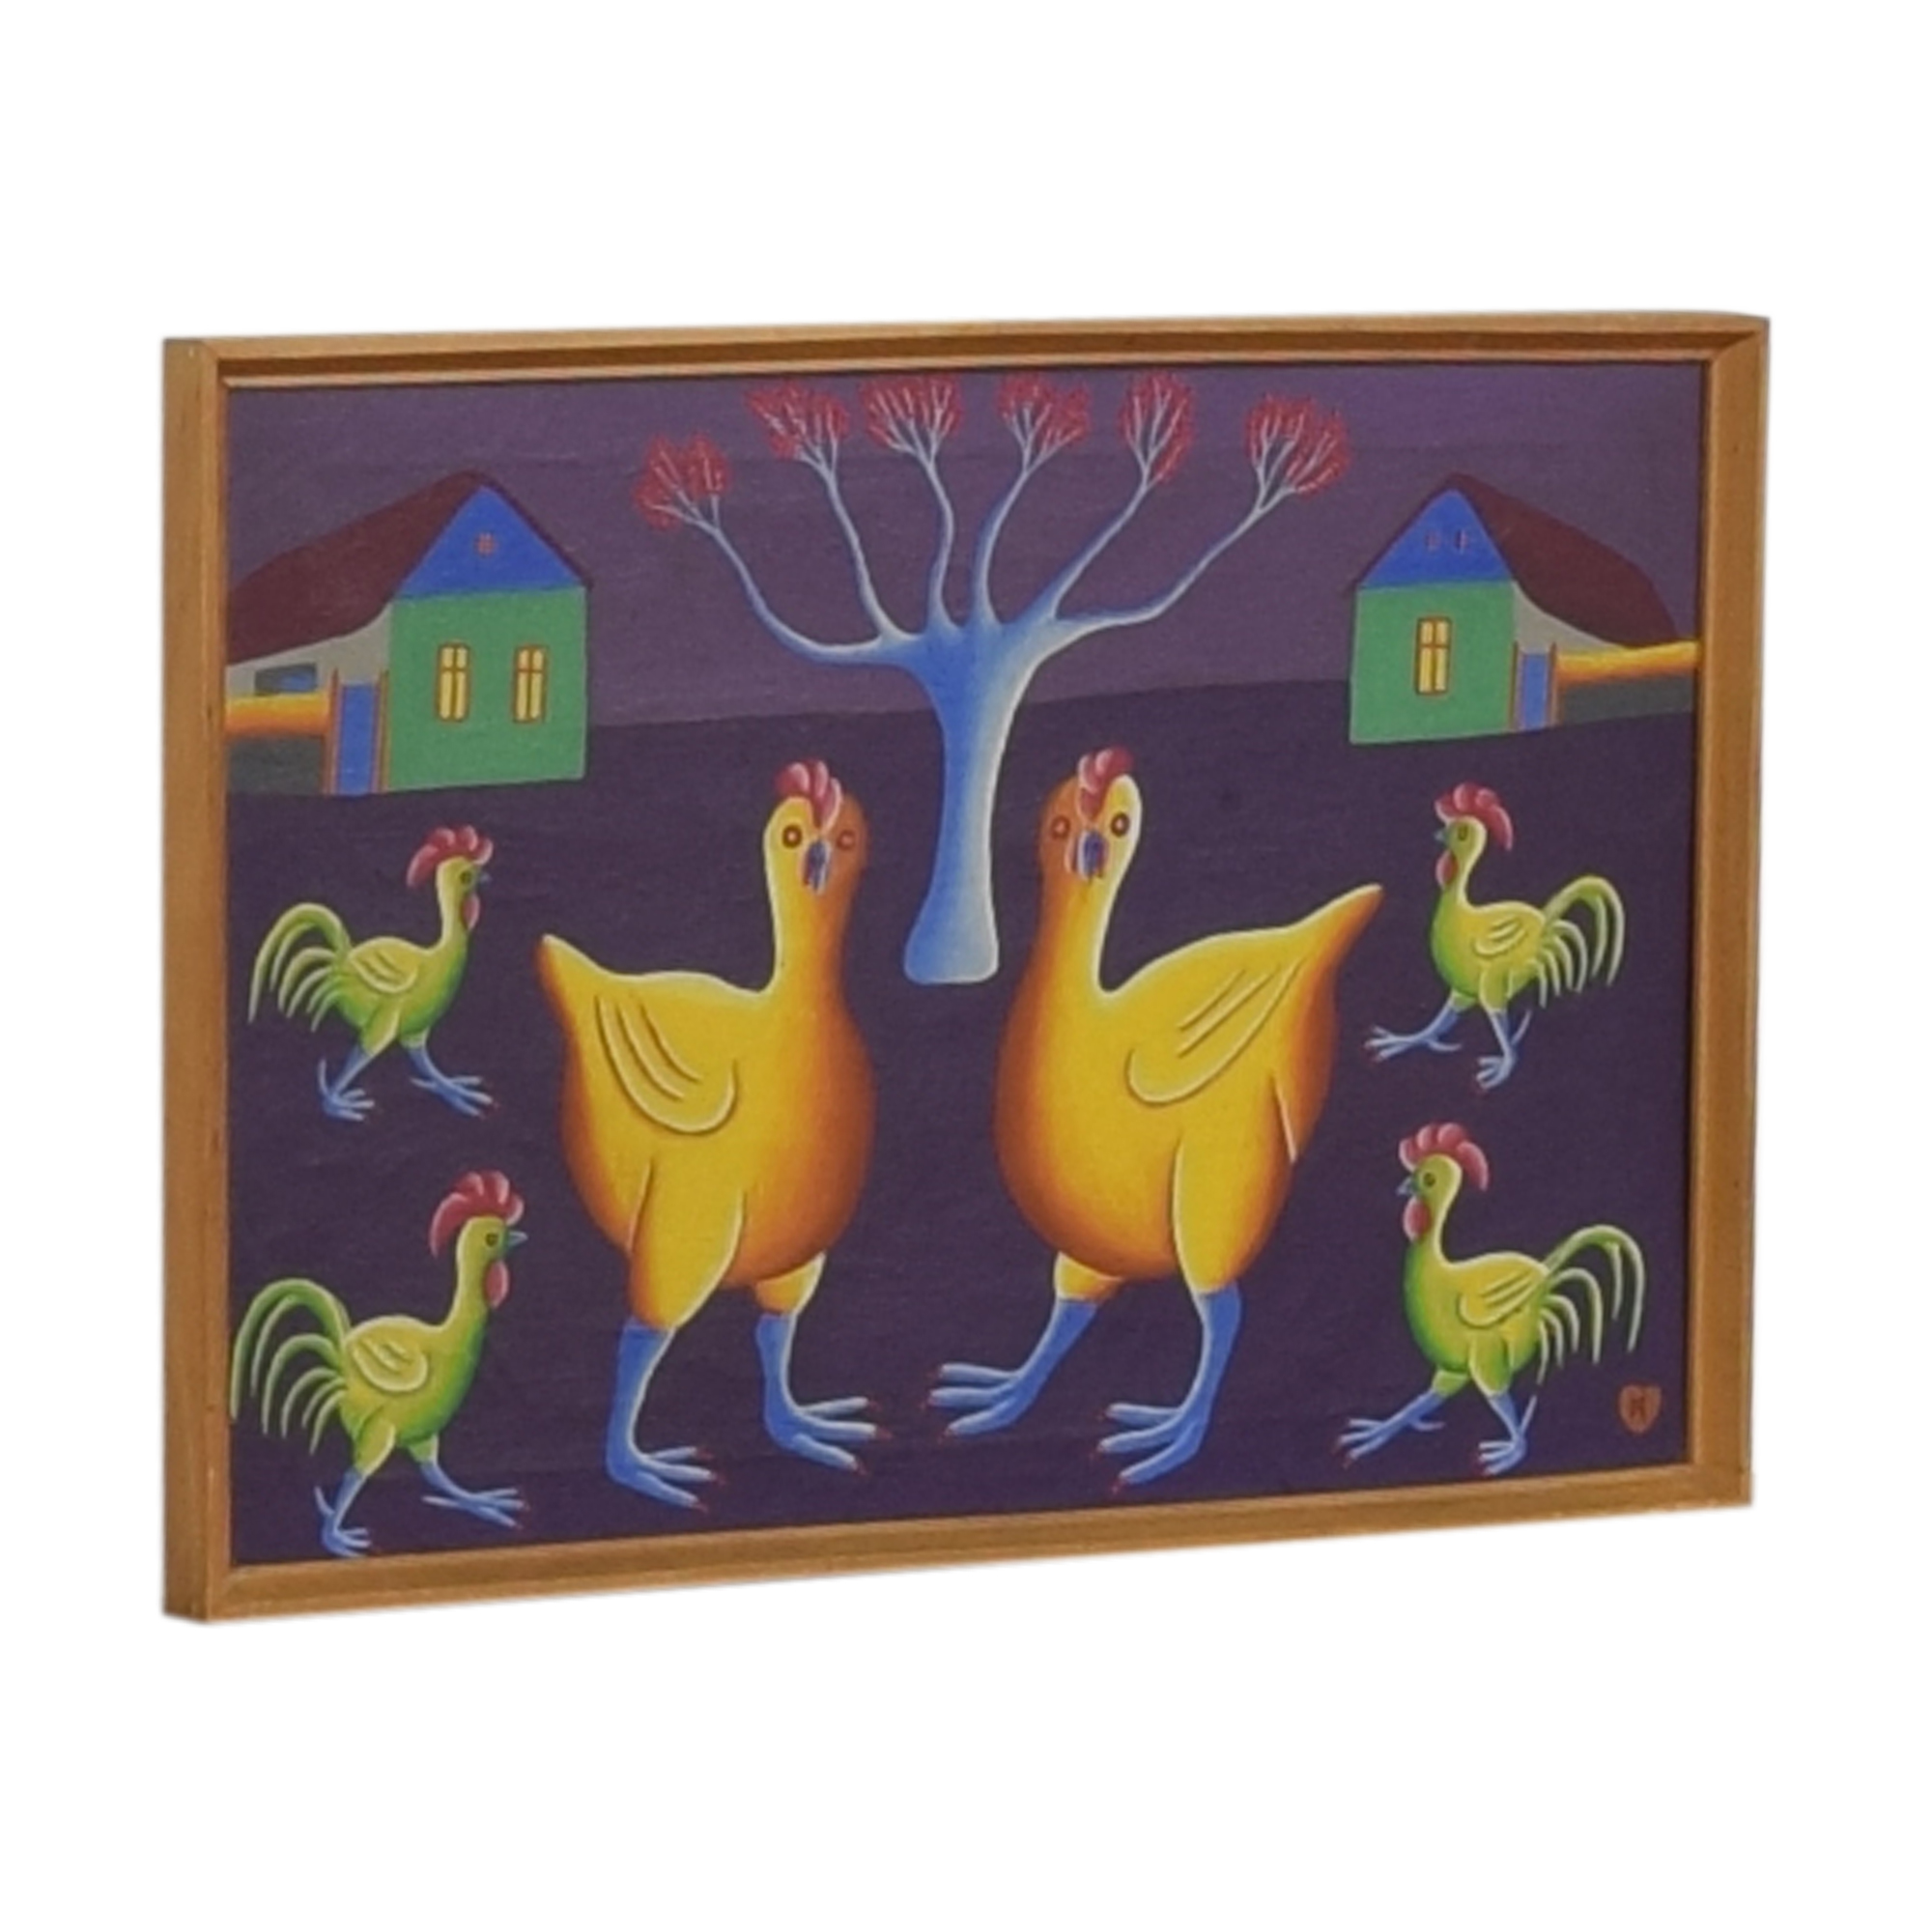 Jan Knjazovic Framed Chicken Painting for sale